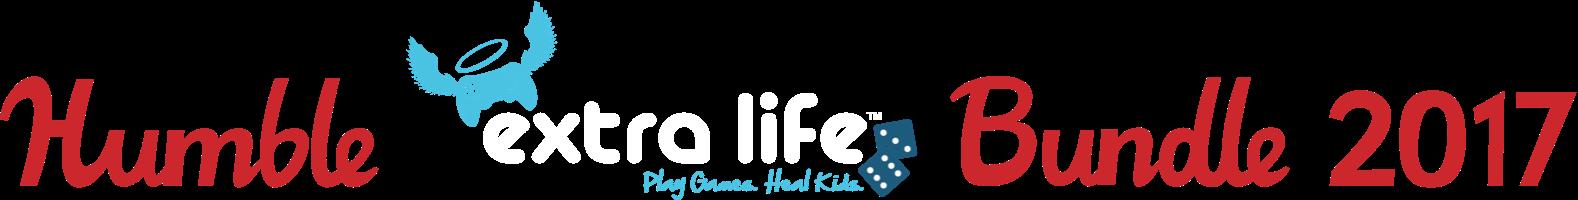 The Humble Extra Life Bundle 2017